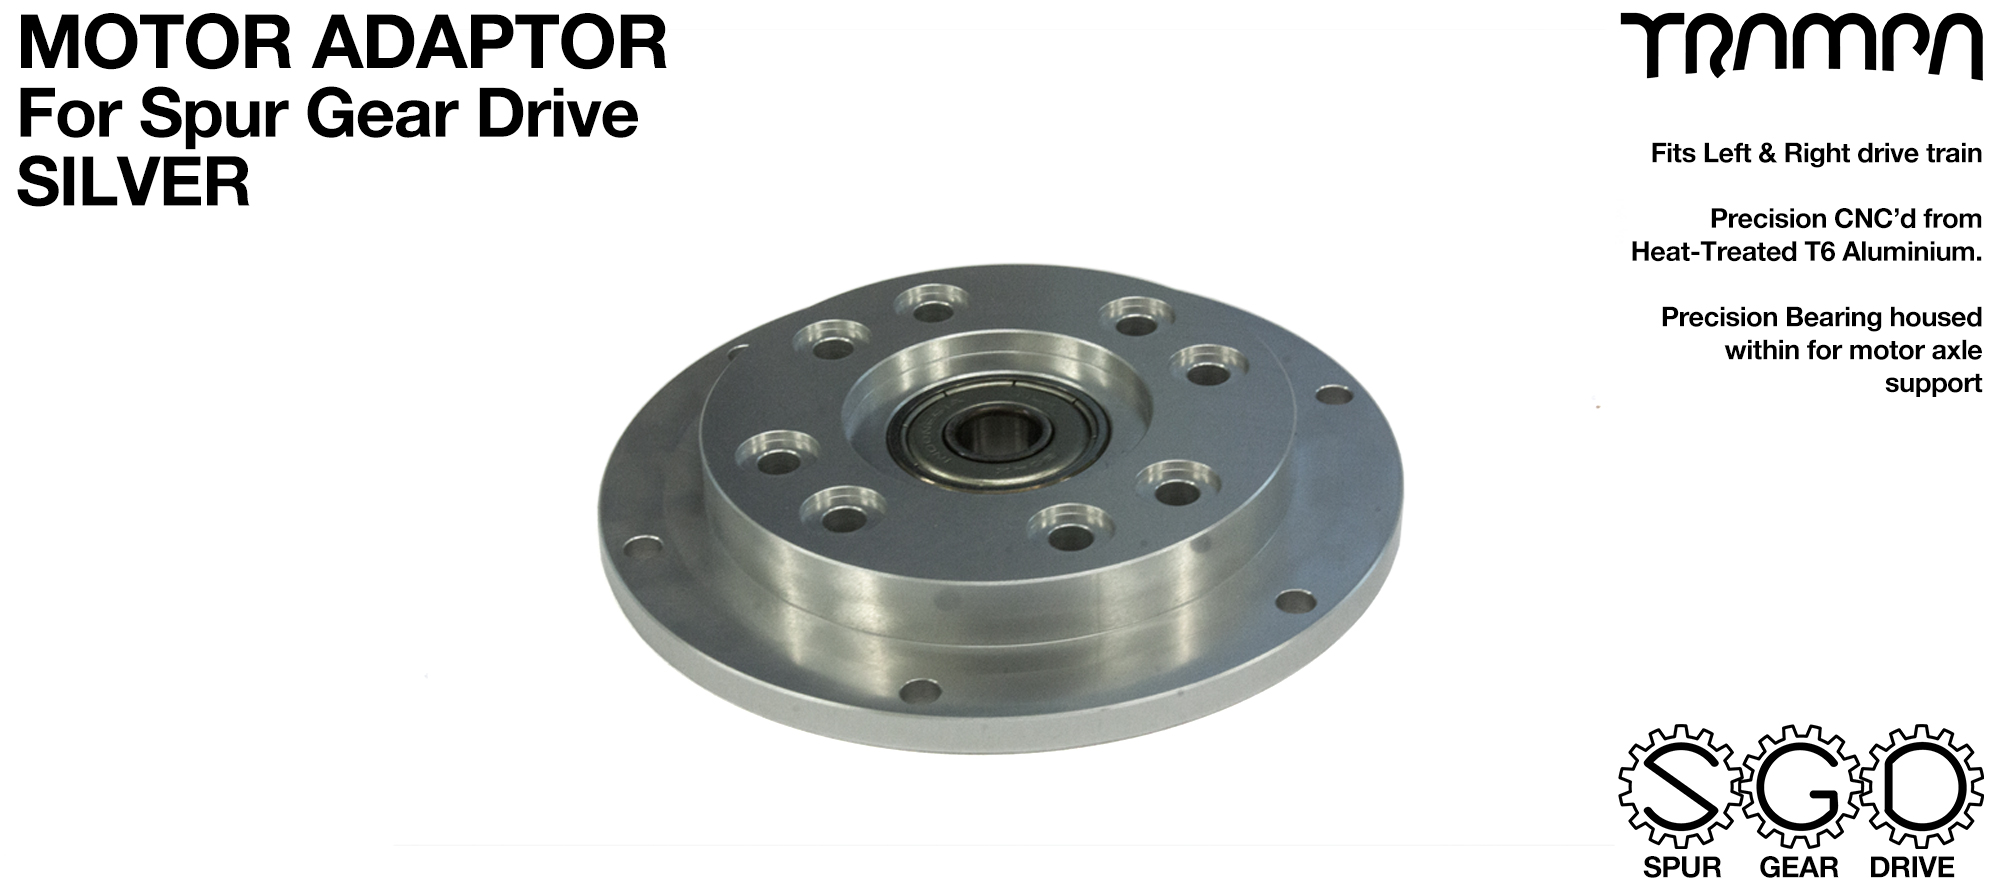 MkII Spur Gear Drive Motor mount Adaptor